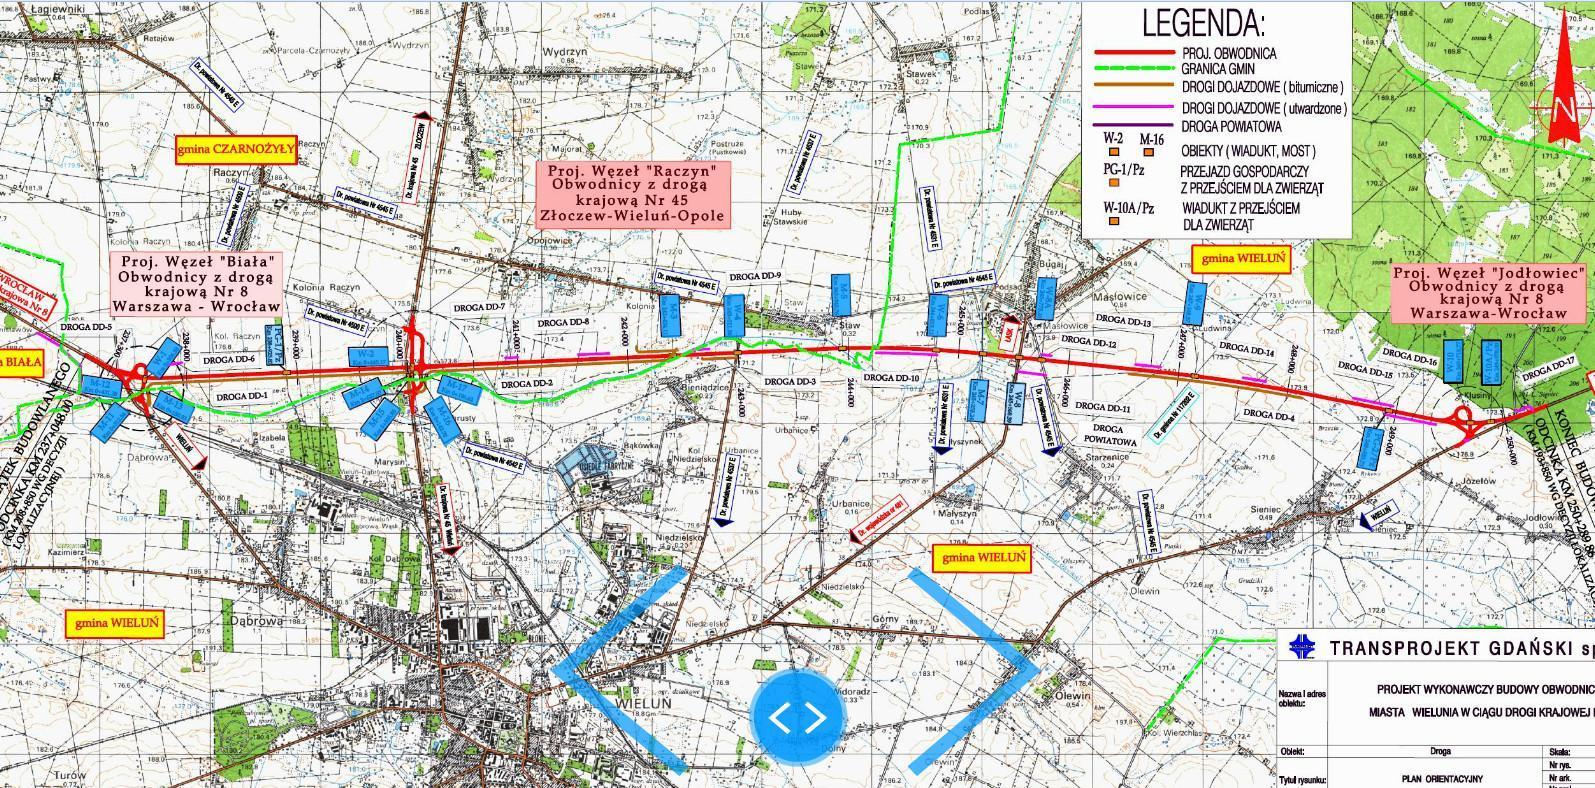 Mapa obwodnicy Wielunia w ciągu DK74 - dawna DK8